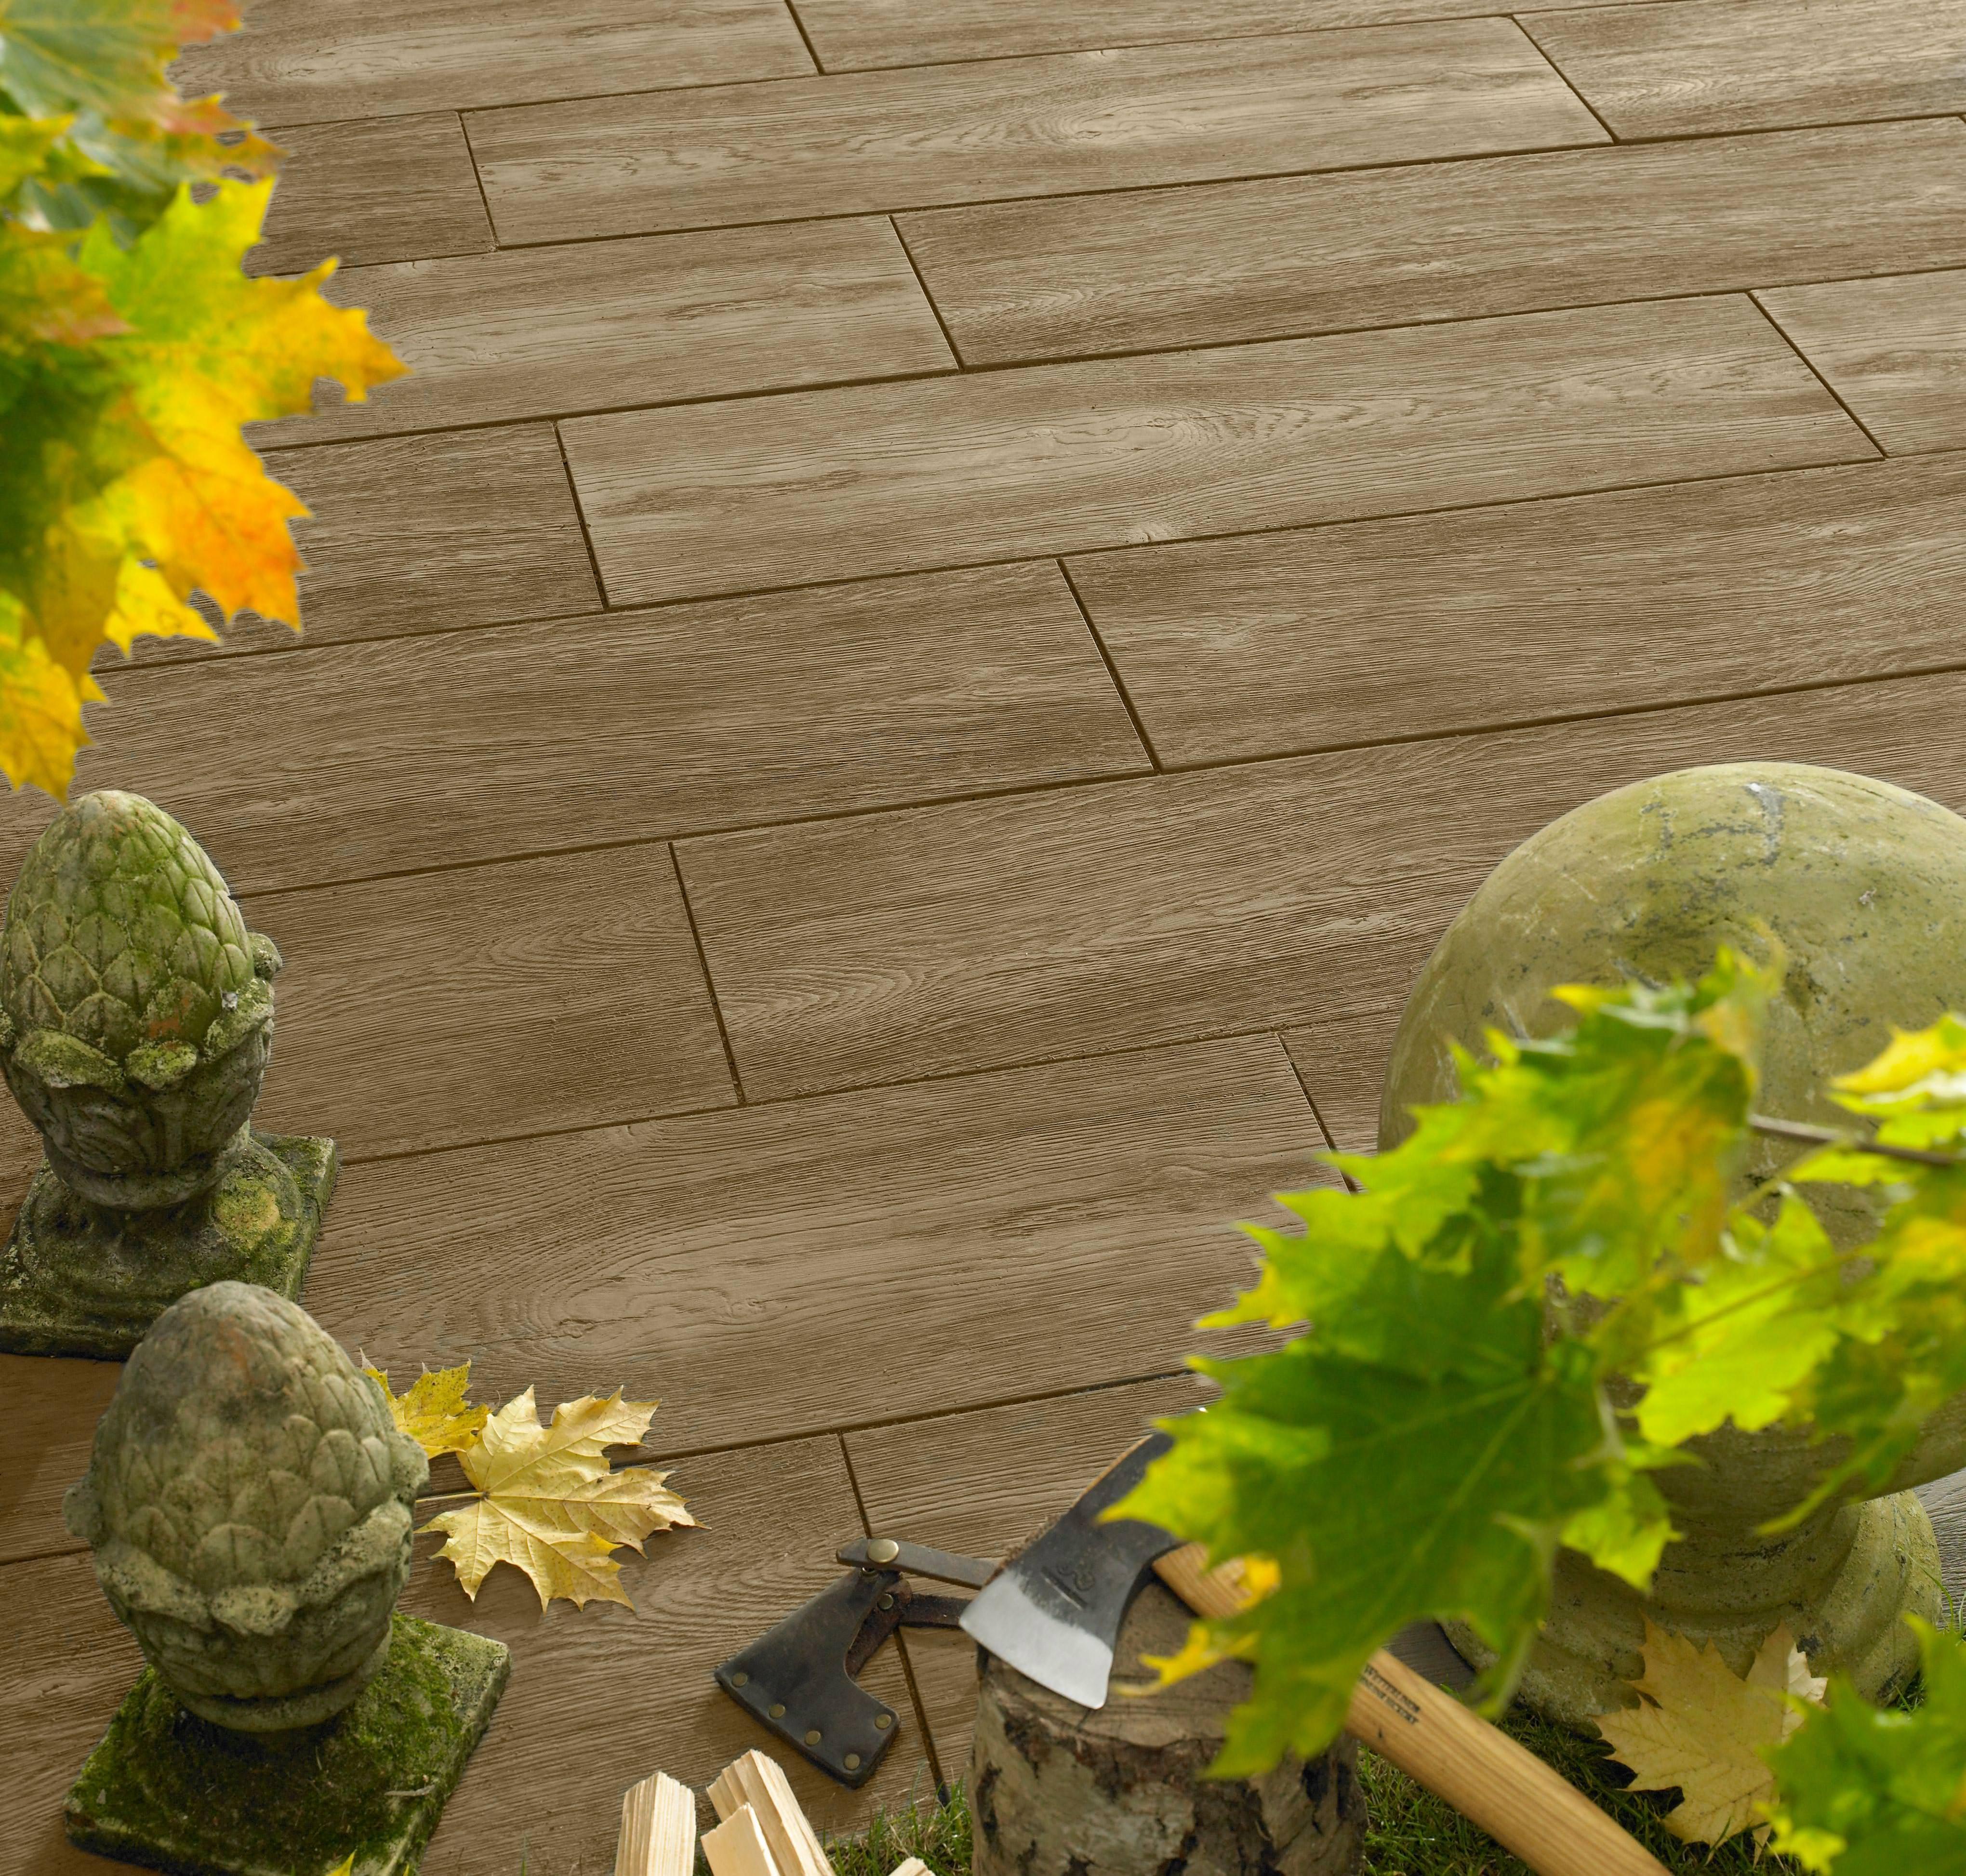 bradstone logplank neue betonplatten in holzdielenoptik. Black Bedroom Furniture Sets. Home Design Ideas